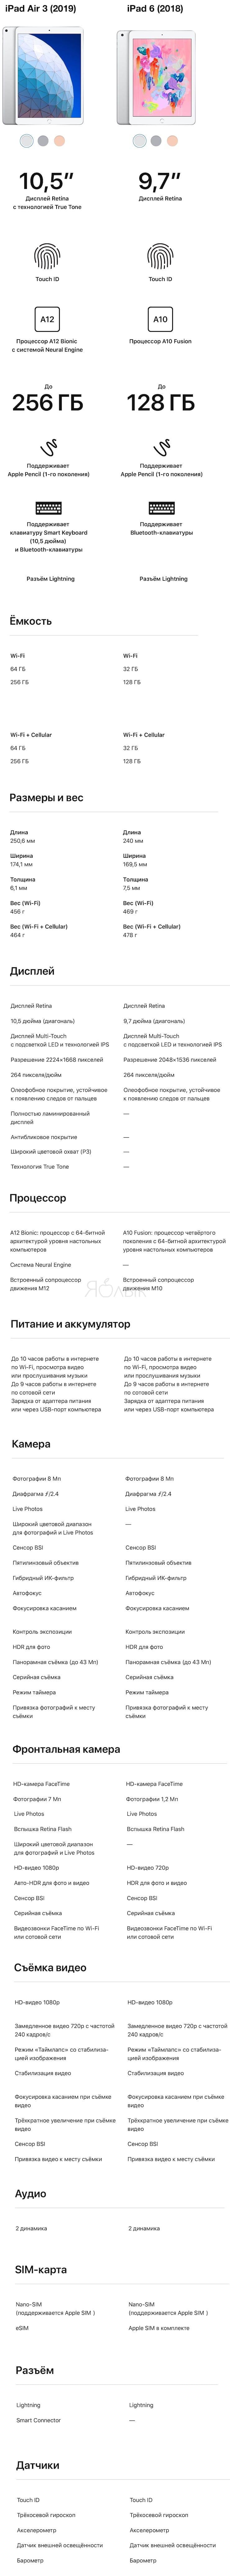 Подробное сравнение технических характеристикiPad Air 3 (2019) и iPad 6 (2018)